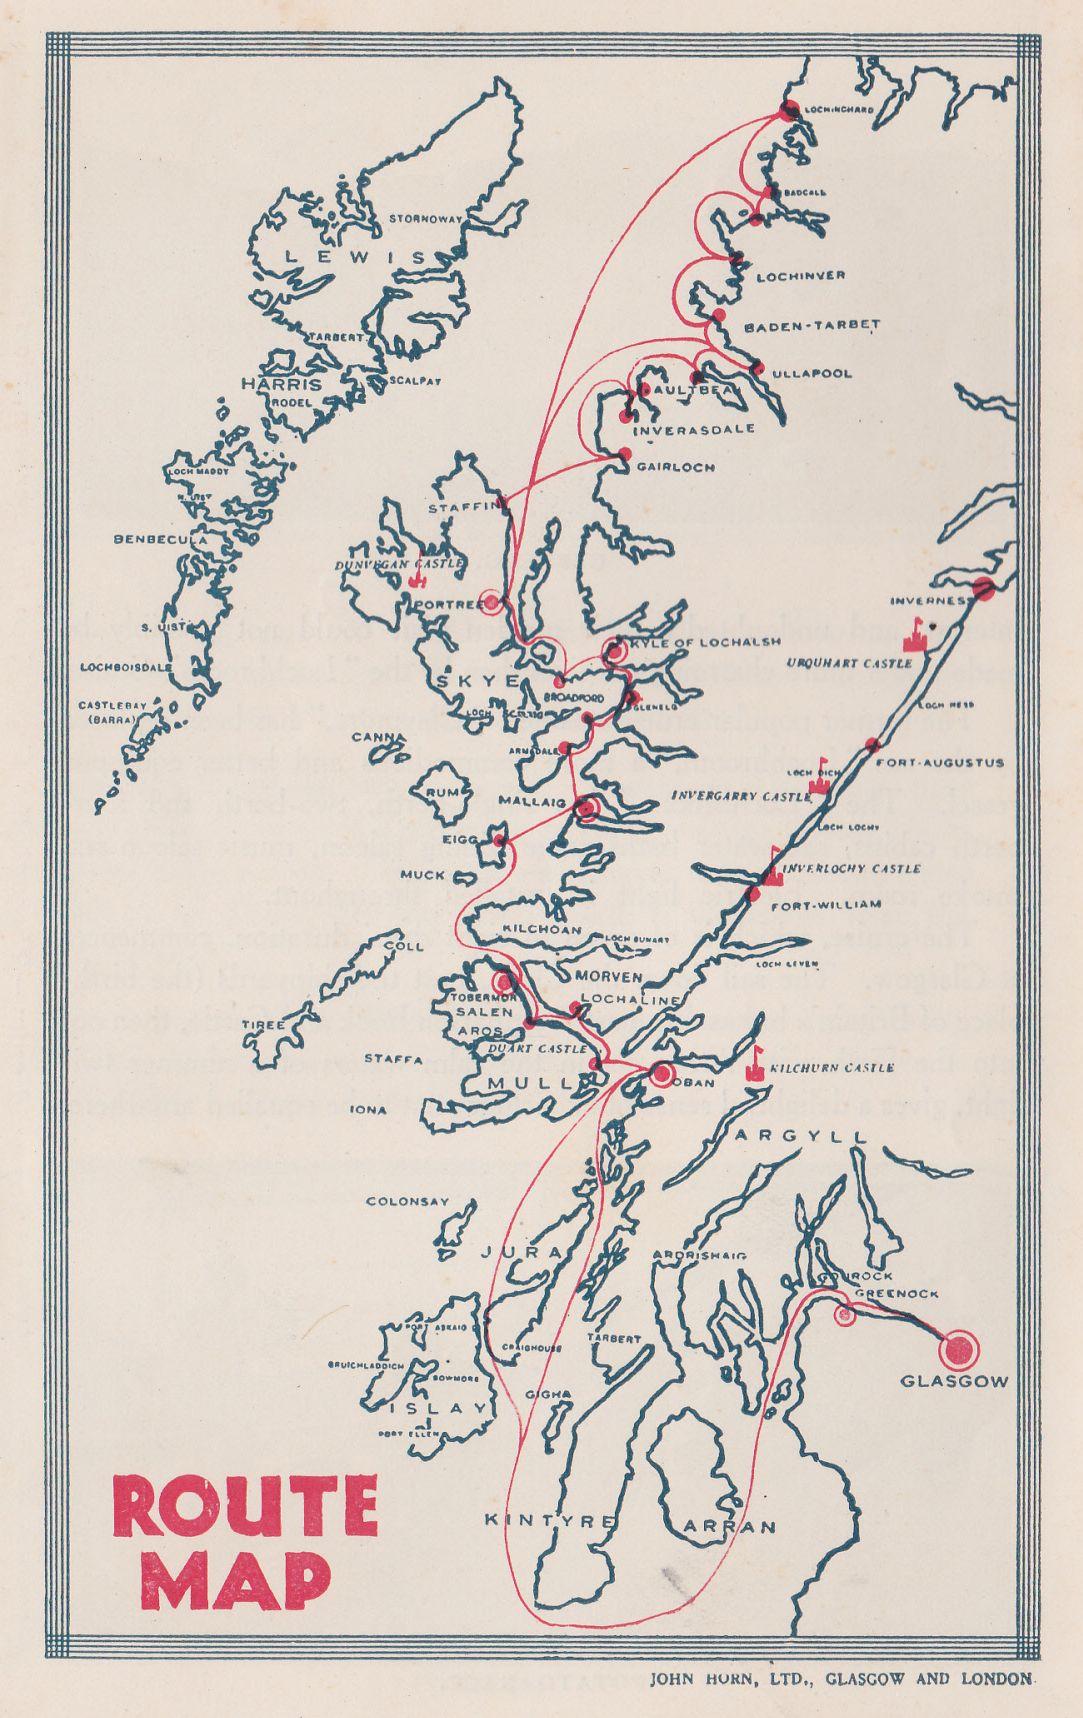 Lochgarry cruise map